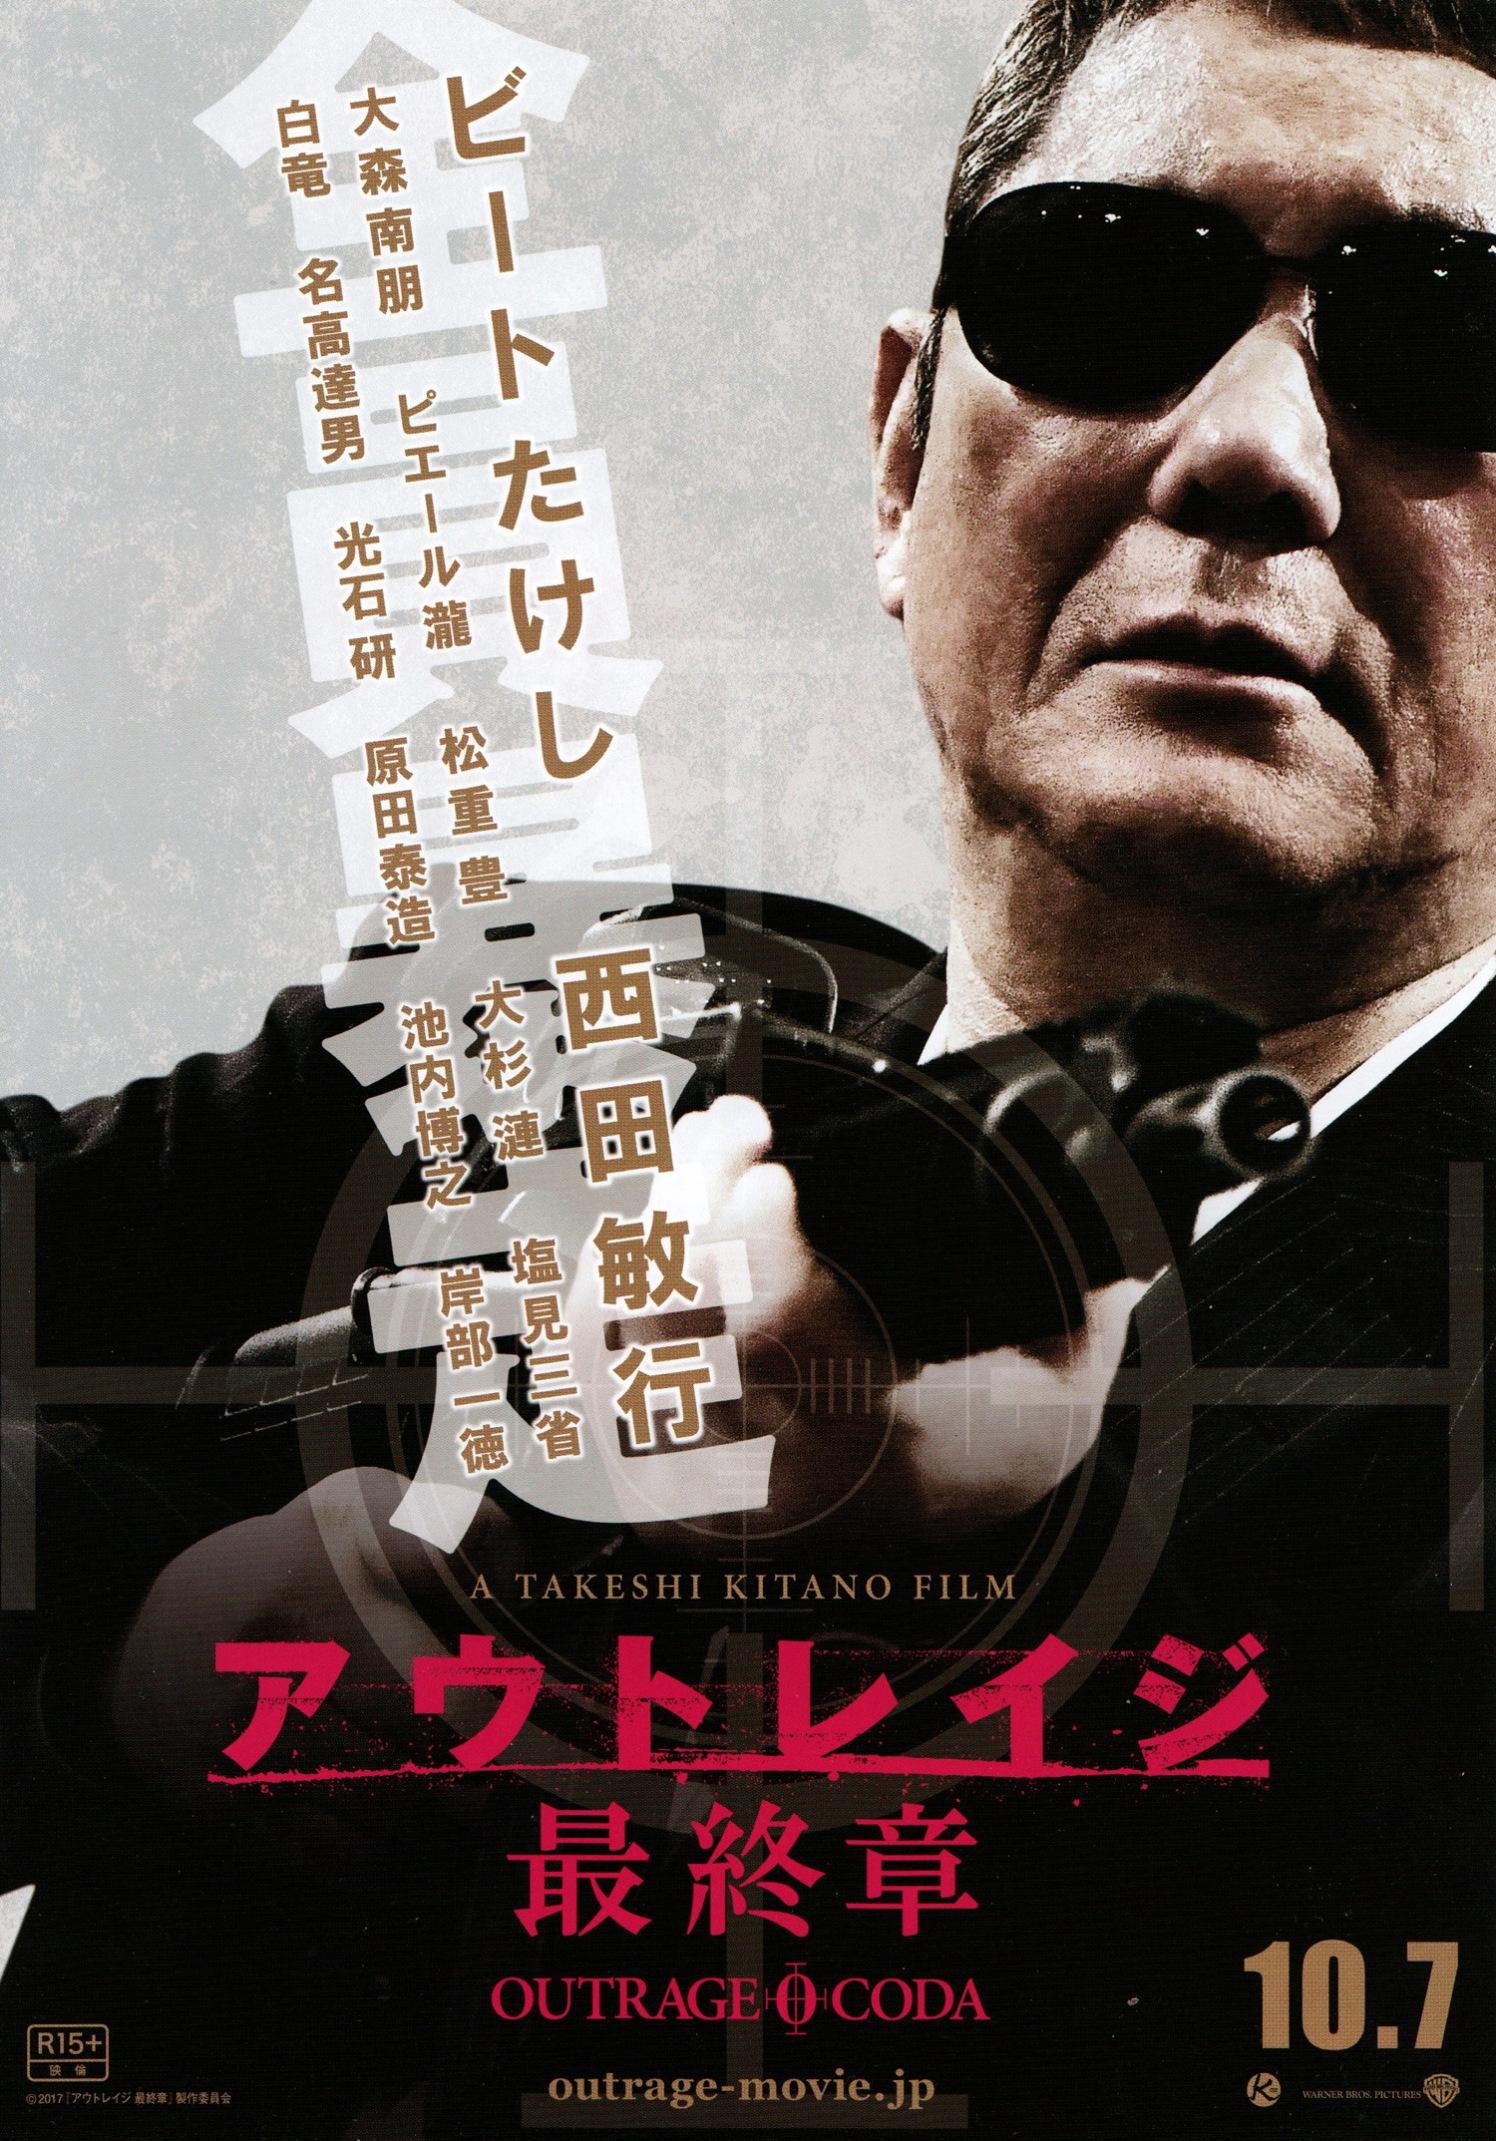 outragecoda-japan-1